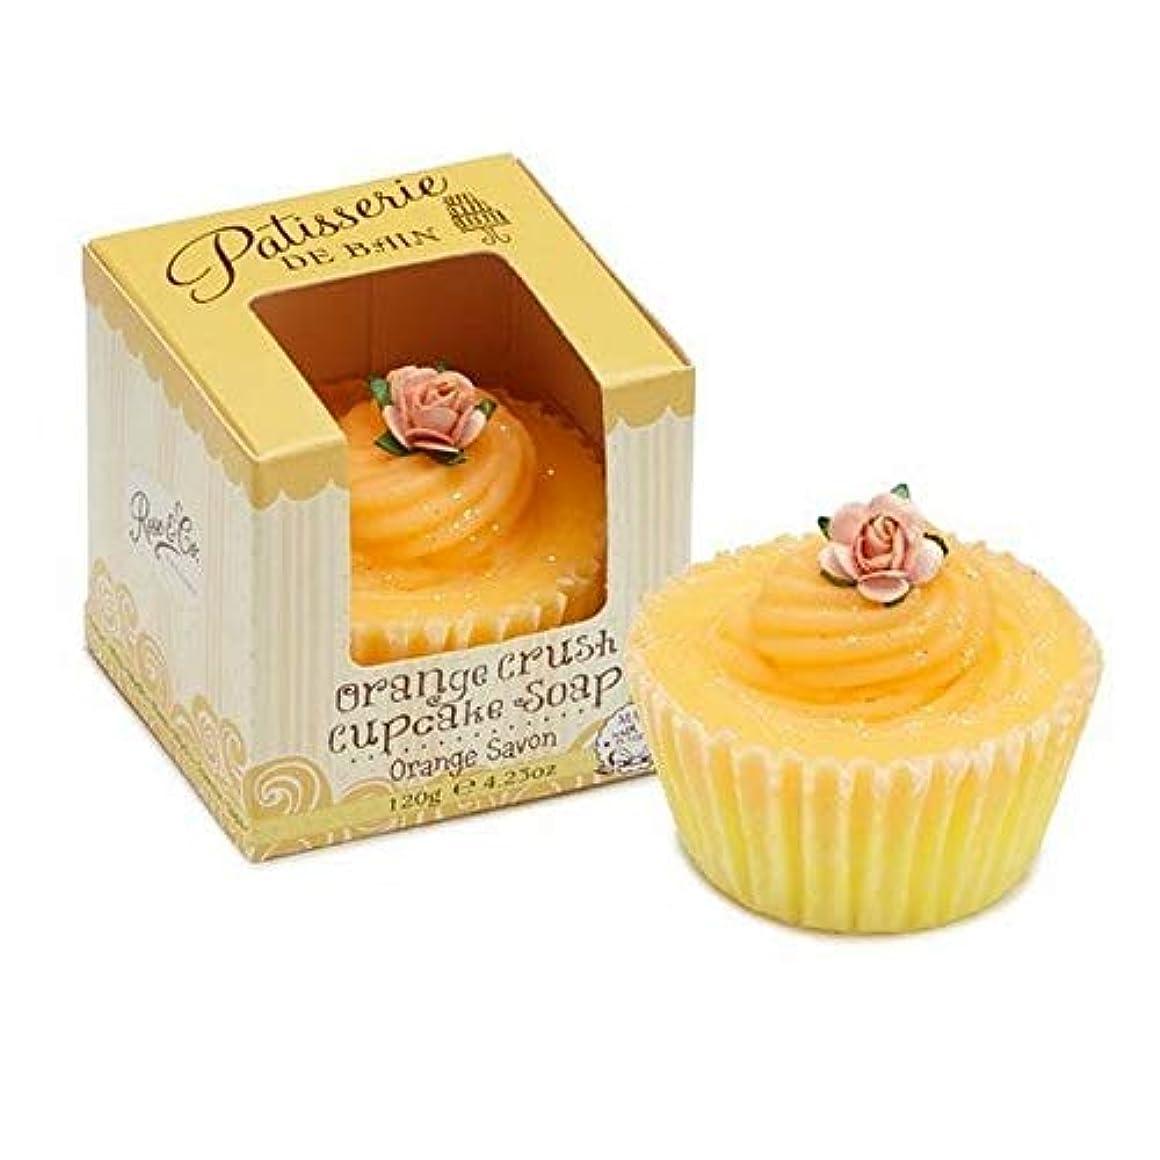 [Patisserie de Bain ] パティスリー?ド?ベインオレンジクラッシュカップケーキソープ120グラム - Patisserie de Bain Orange Crush Cupcake soap 120g...